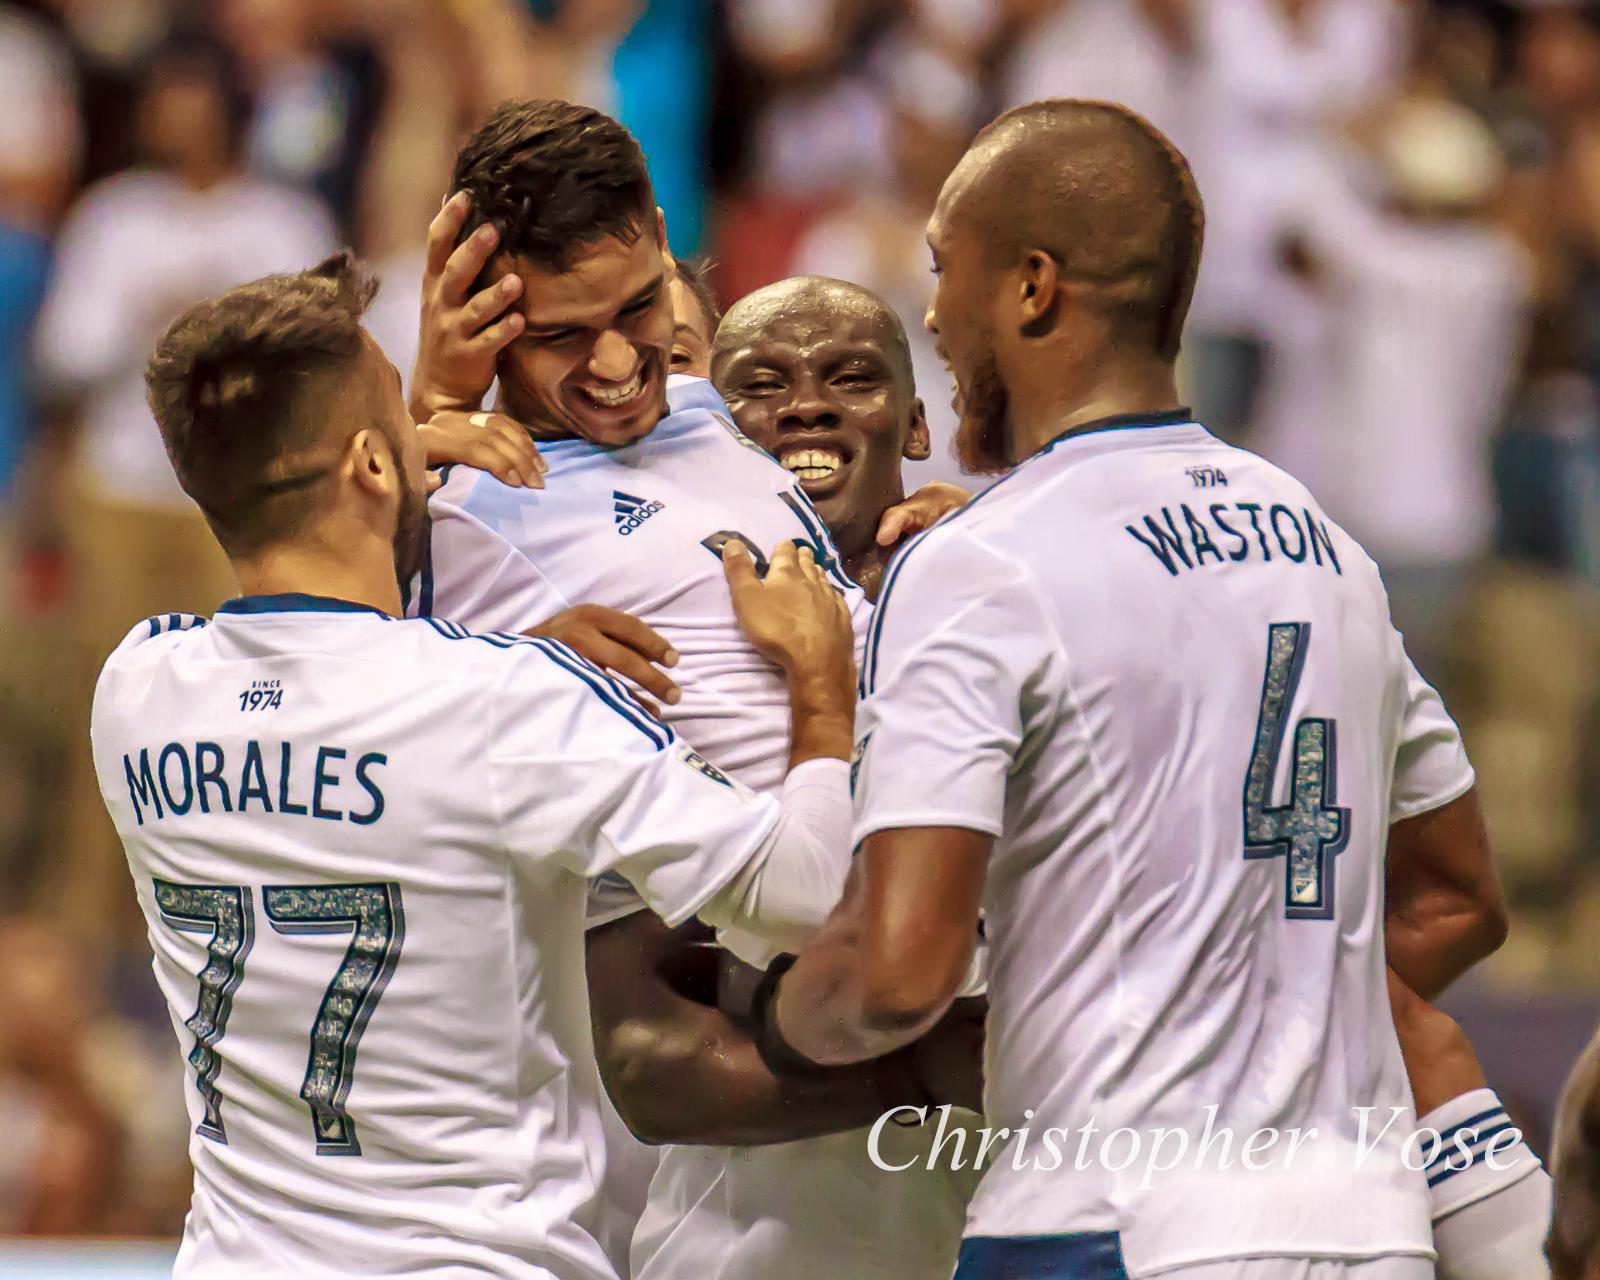 2015-08-08 Cristian Techera's Second Goal Celebration 1.jpg